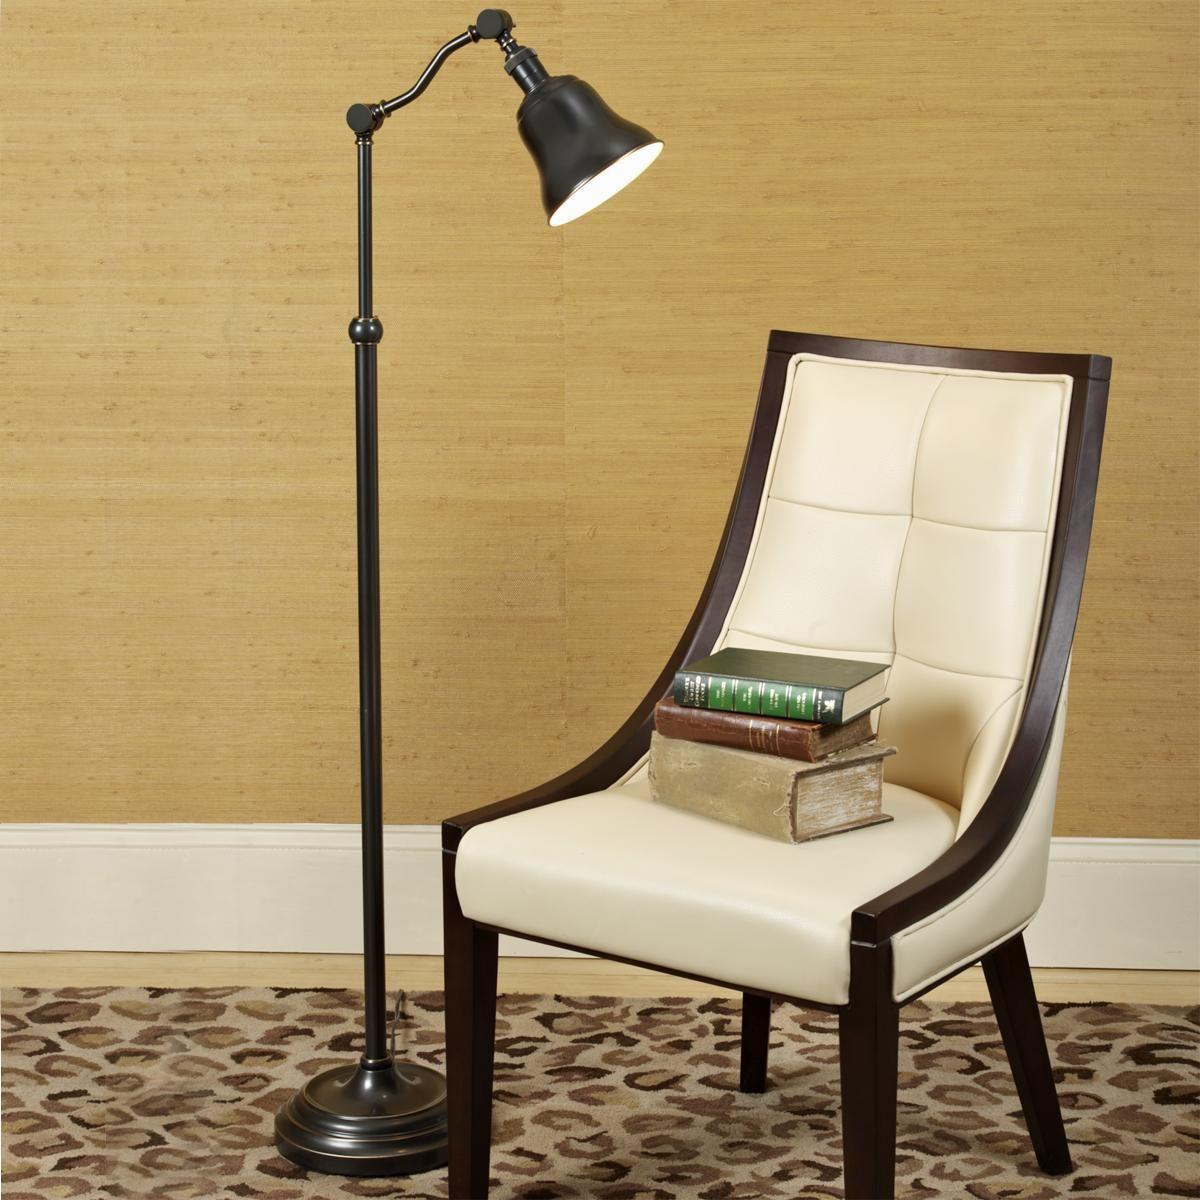 Bell Shade Adjustable Pharmacy Floor Lamp (2 finishes